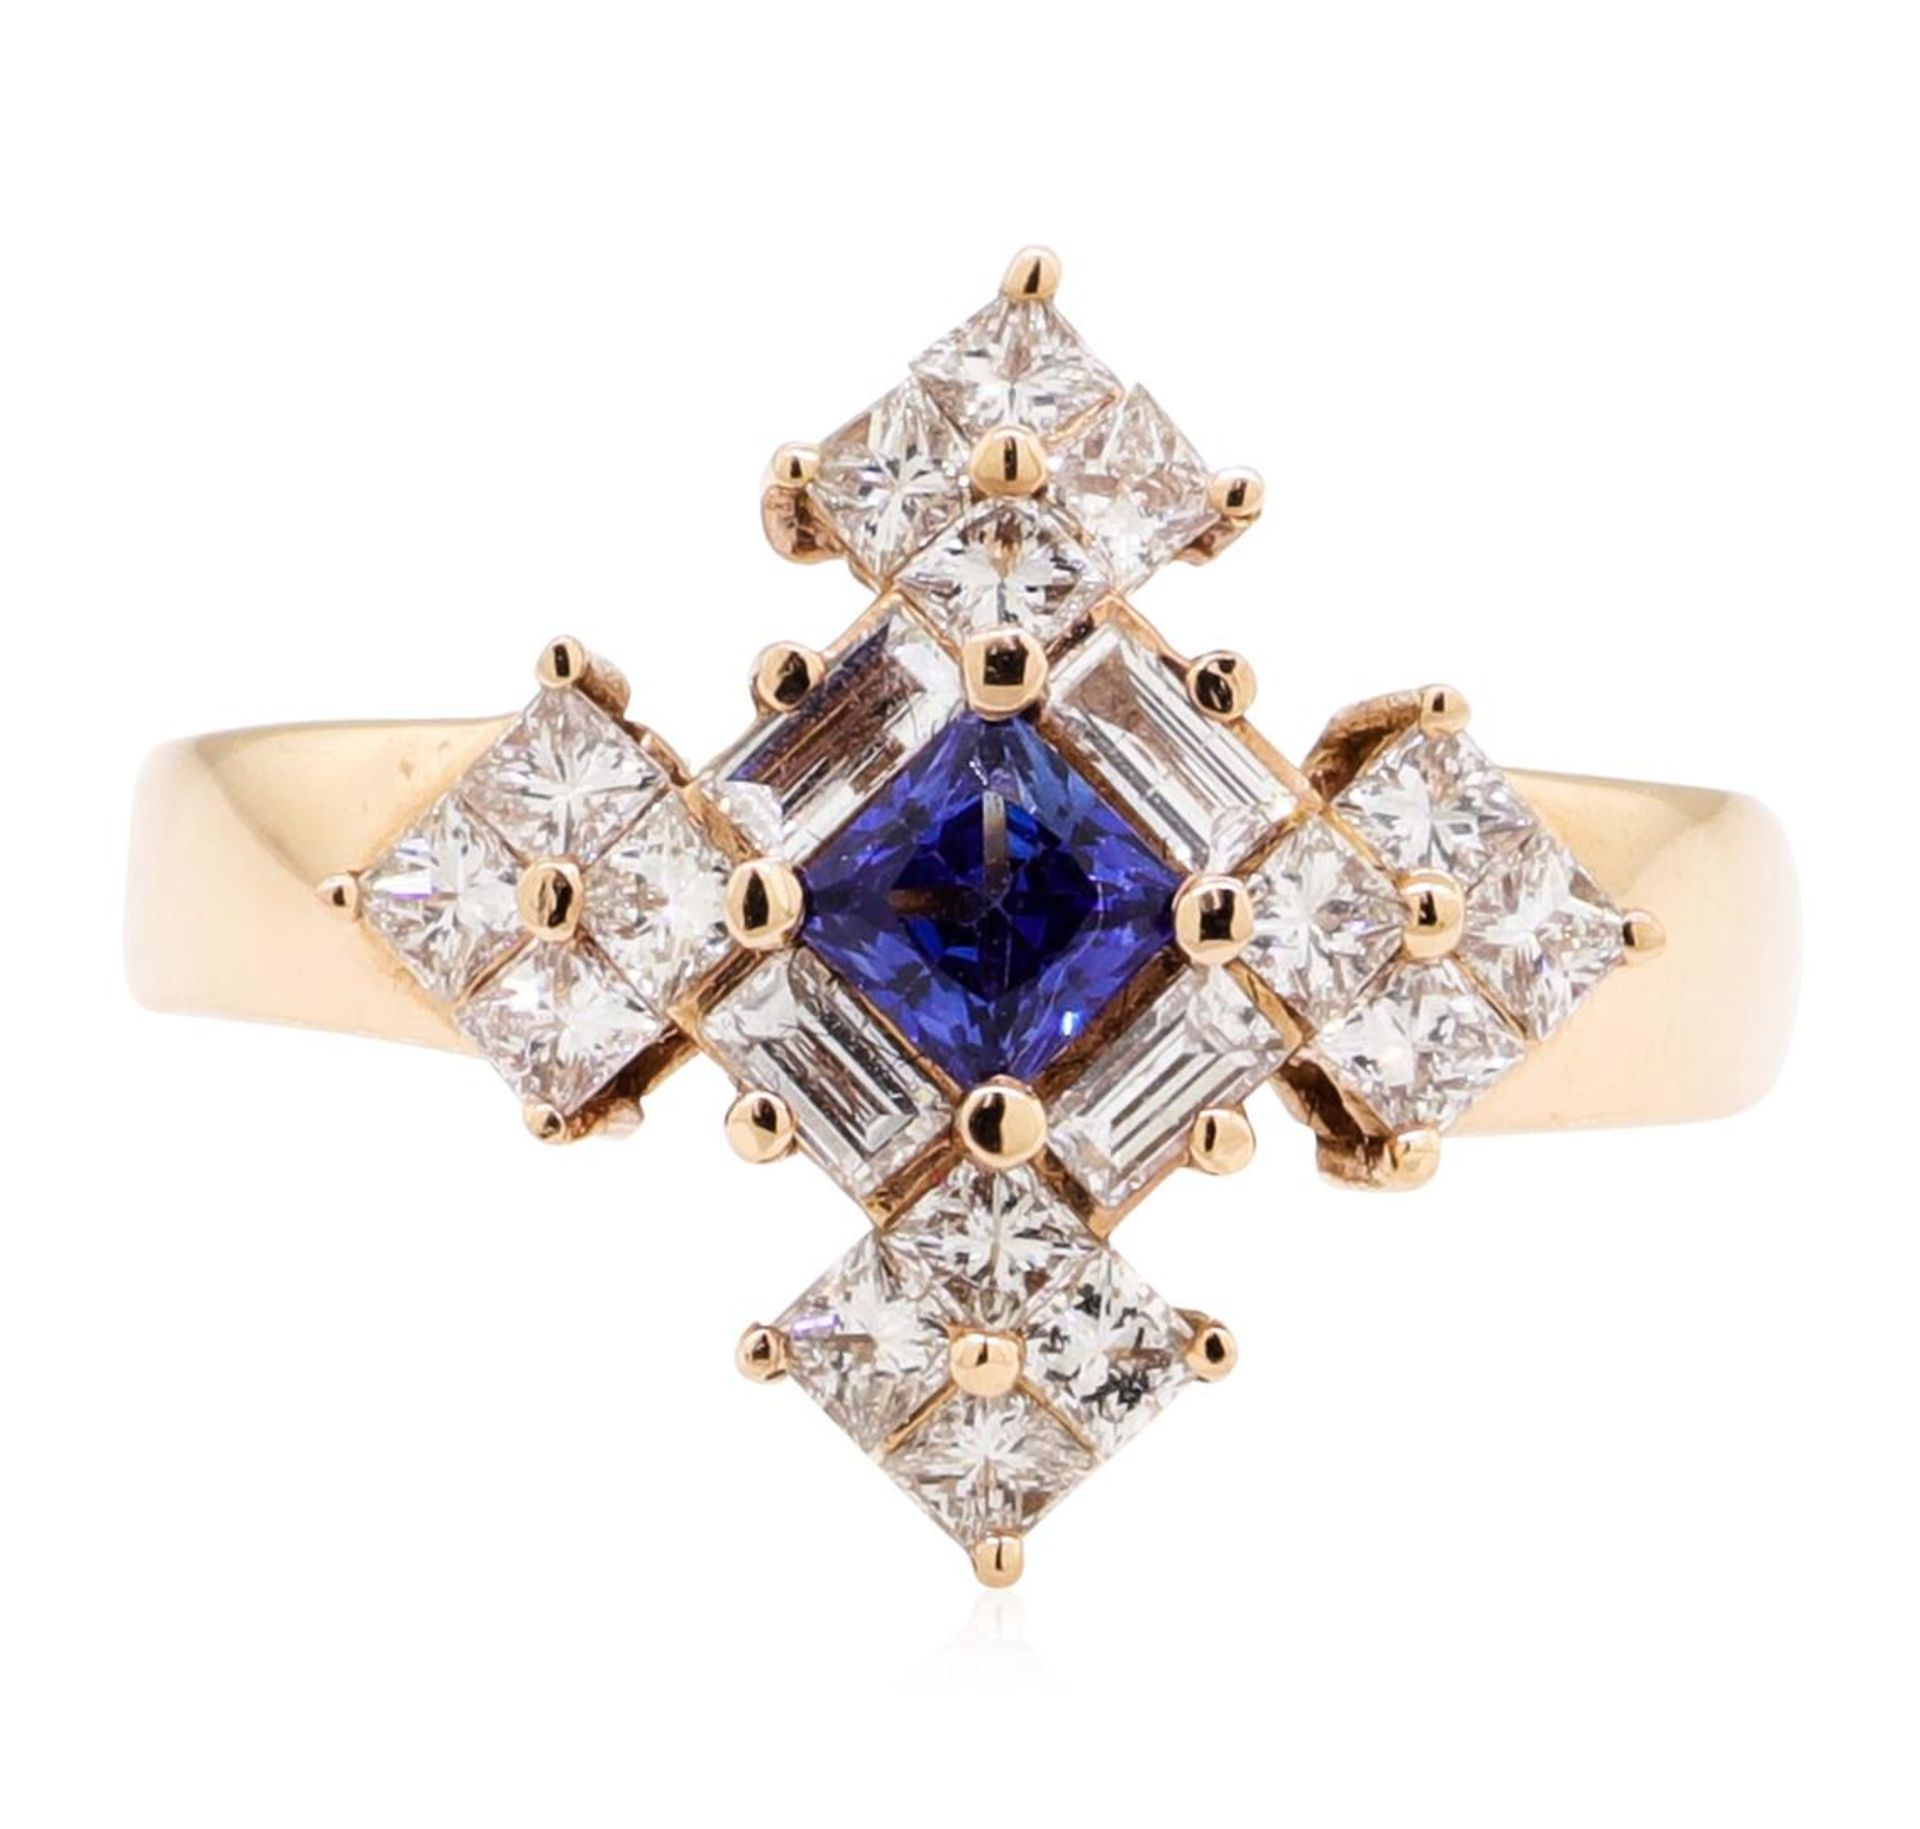 1.16 ctw Princess Brilliant Blue Sapphire And Baguette Cut Diamond Ring - 14KT R - Image 2 of 5